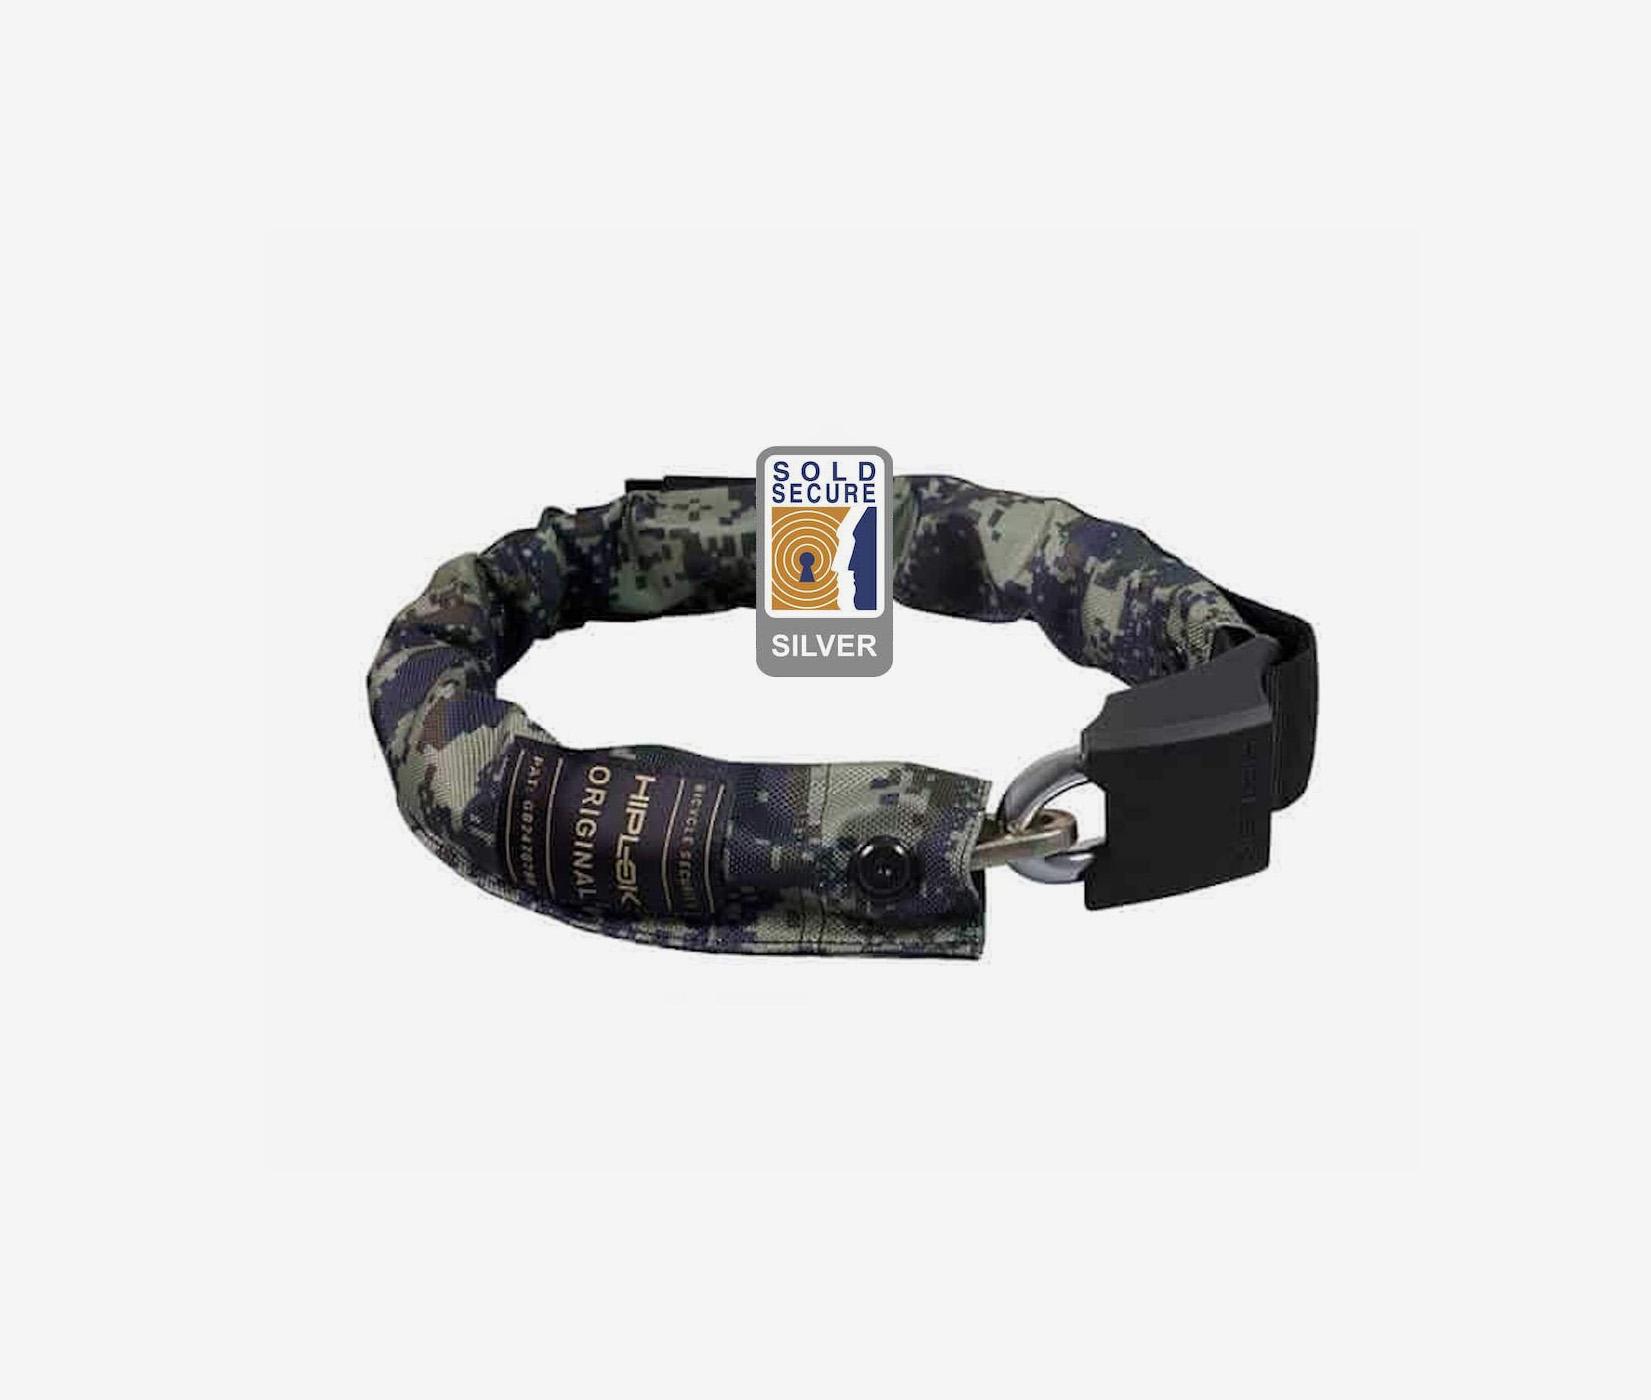 Hiplok original wearable chain lock bike lock sold secure camouflage